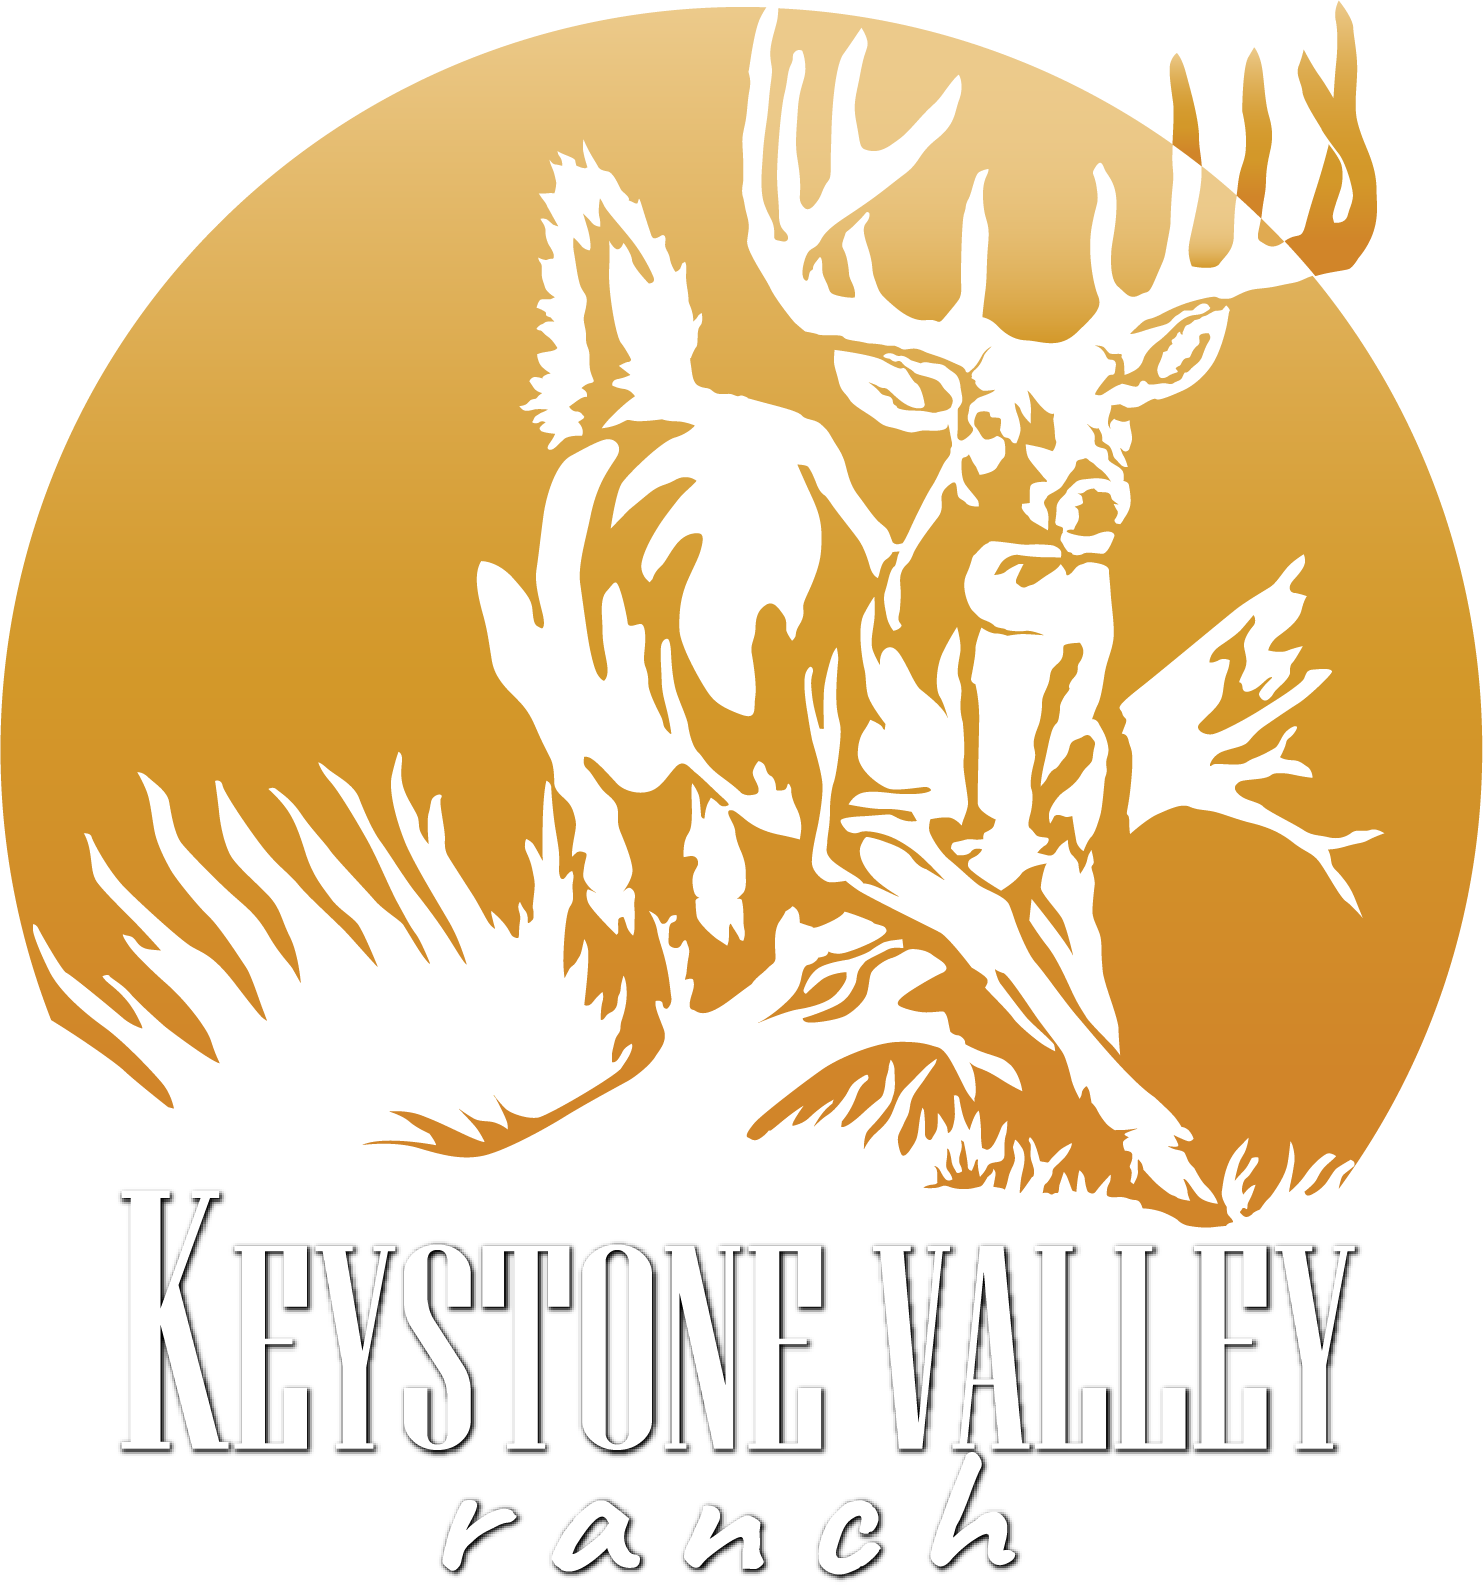 Guided Hunts For Trophy Bucks Wild Boar And Elk In Pa Keystone Valley Ranch